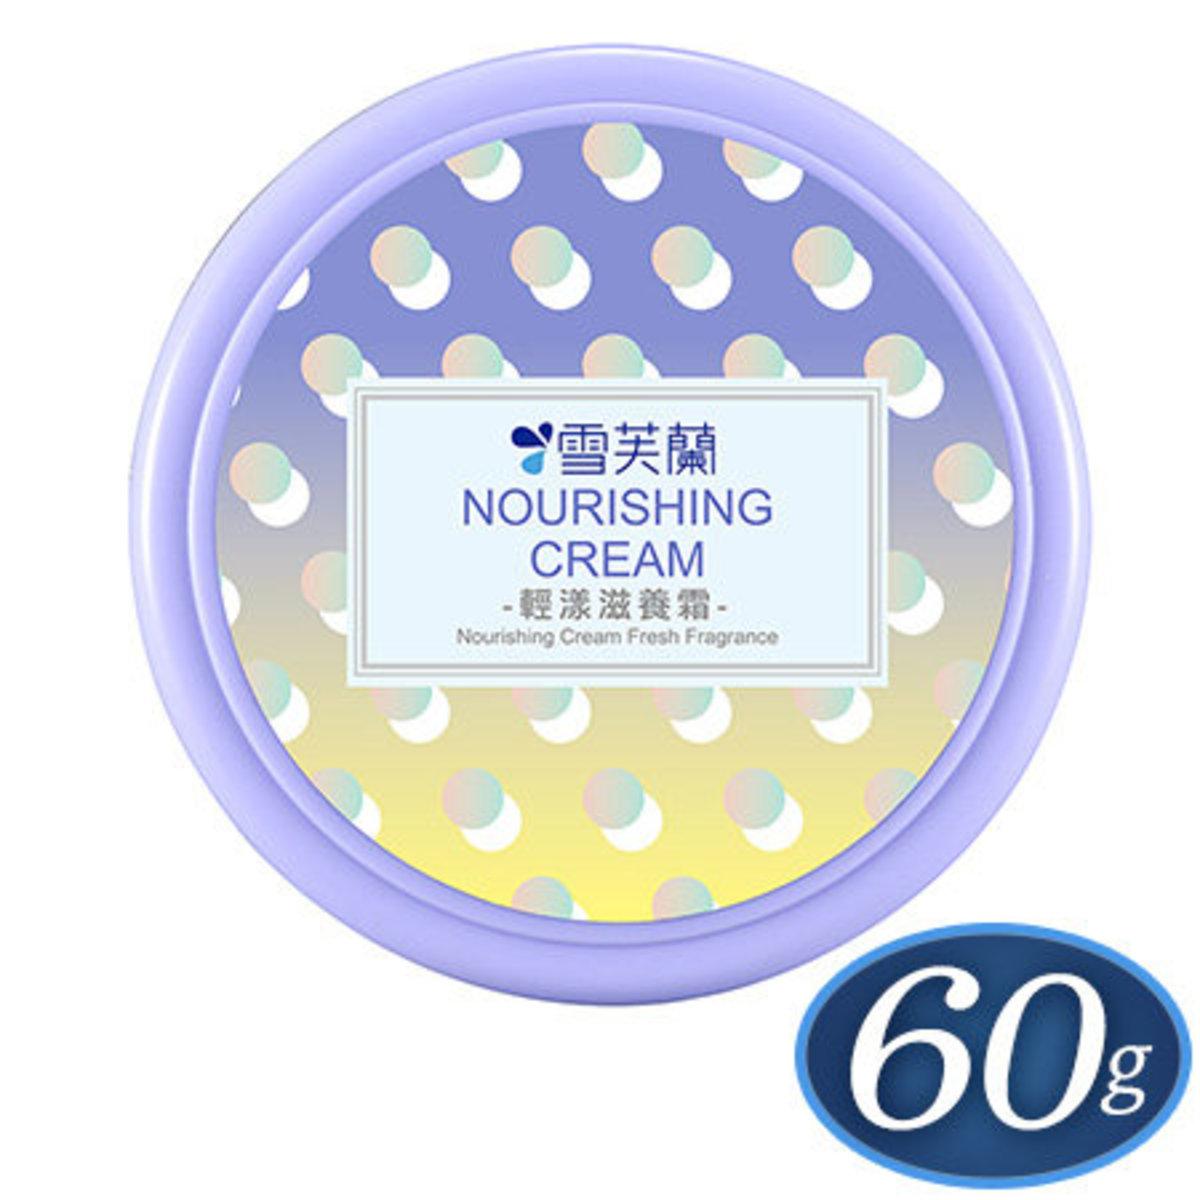 Nourishing cream Fresh Fragrance 60g (4710221310265)